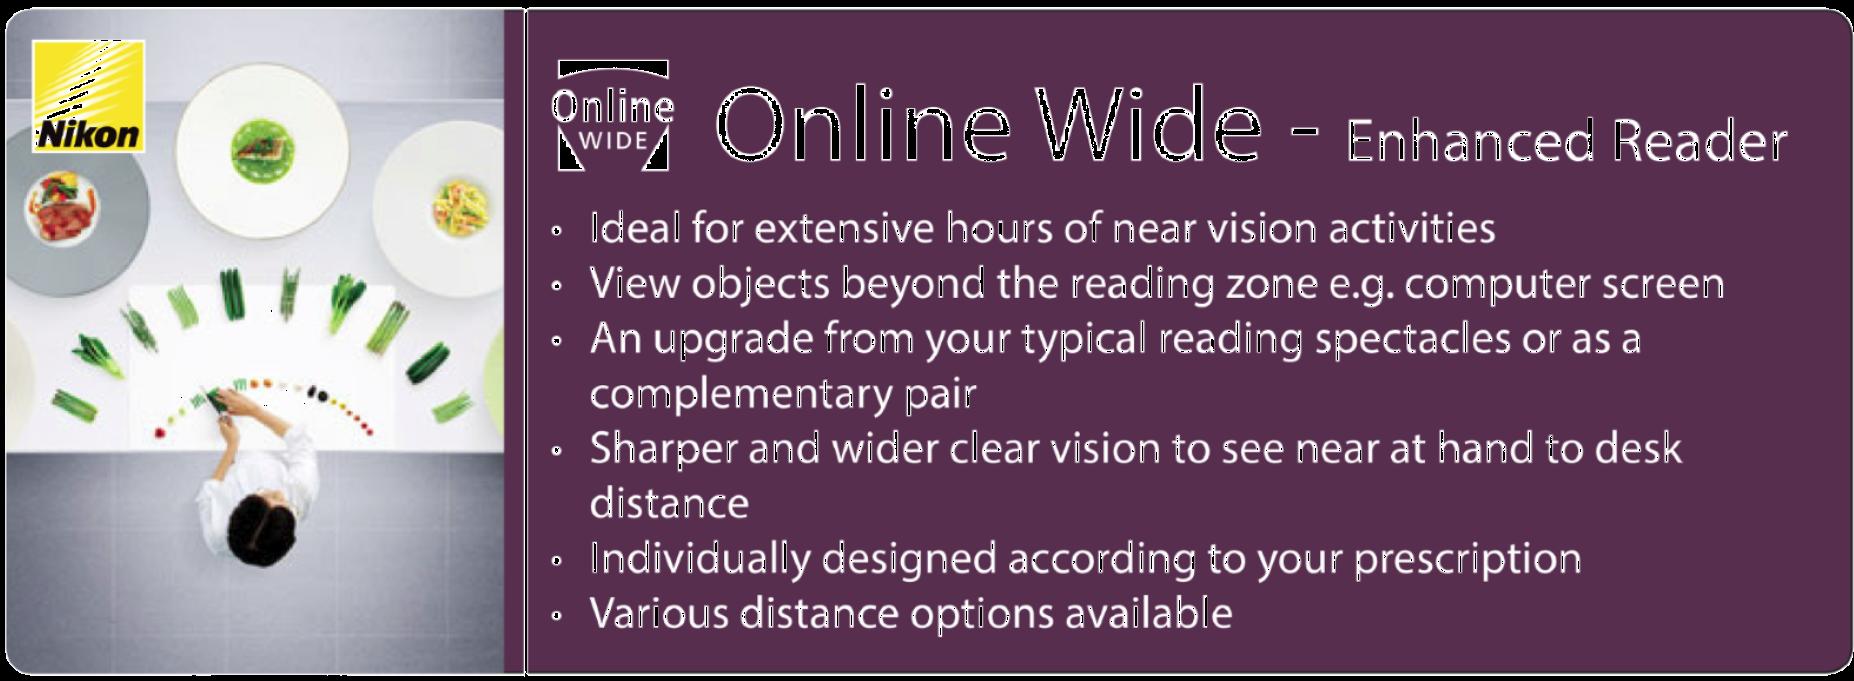 Nikon 5. Online Wide - Enhanced Reader